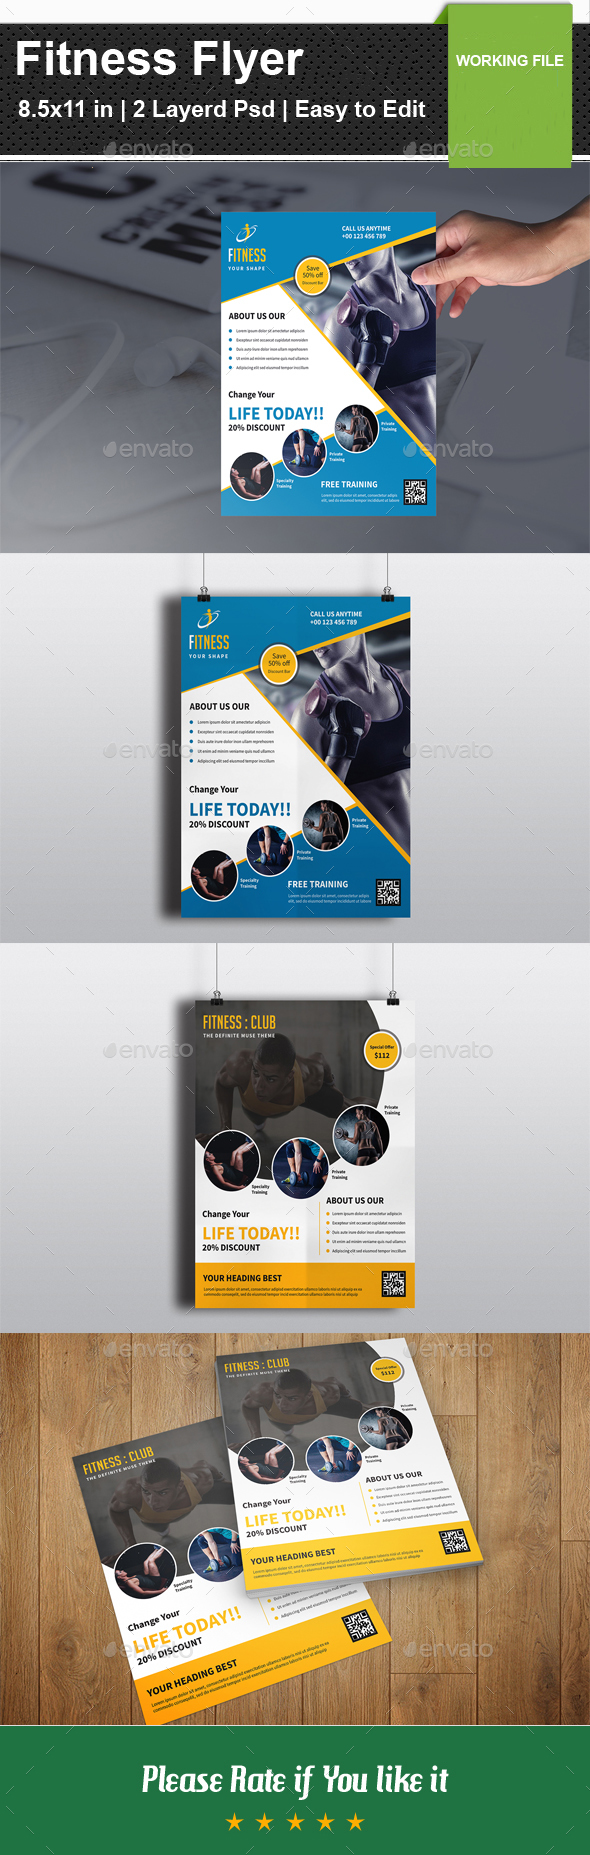 Fitness Flyer-V03 - Corporate Flyers